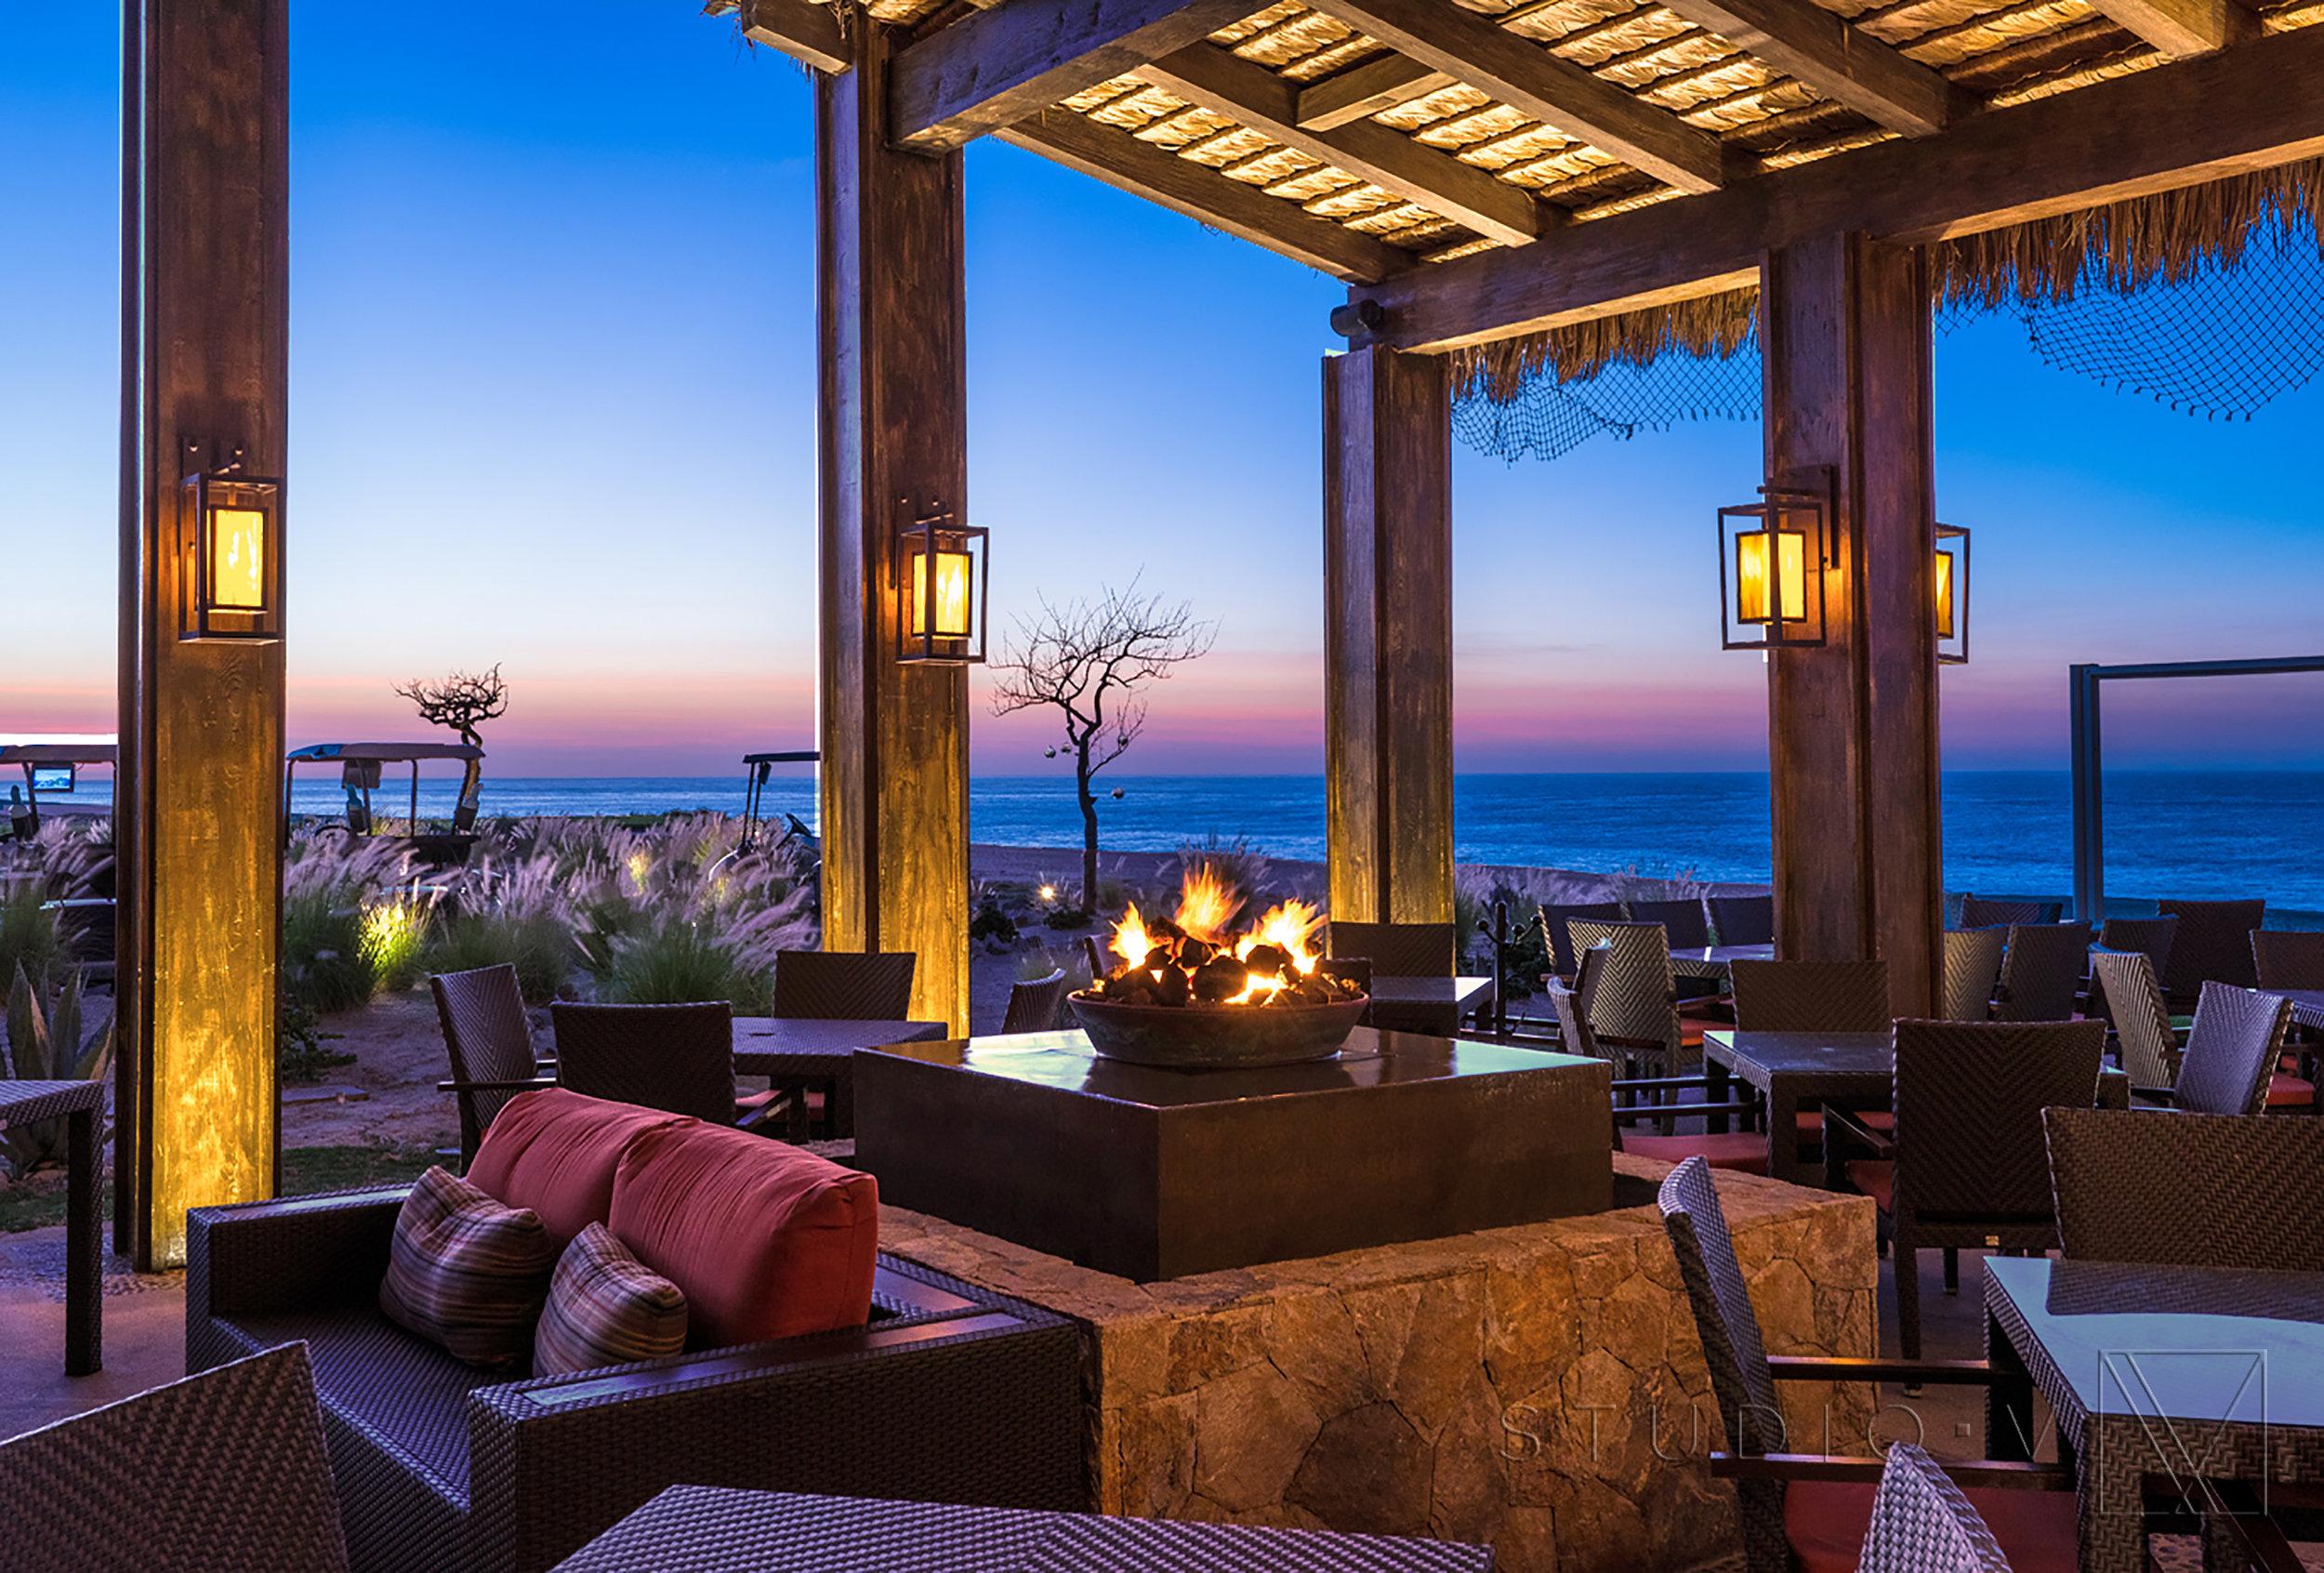 Quivira Clubhouse Sunset Beach Cabo San Lucas Studio V Interior Architecture and Design Scottsdale Arizona AZ (9).jpg